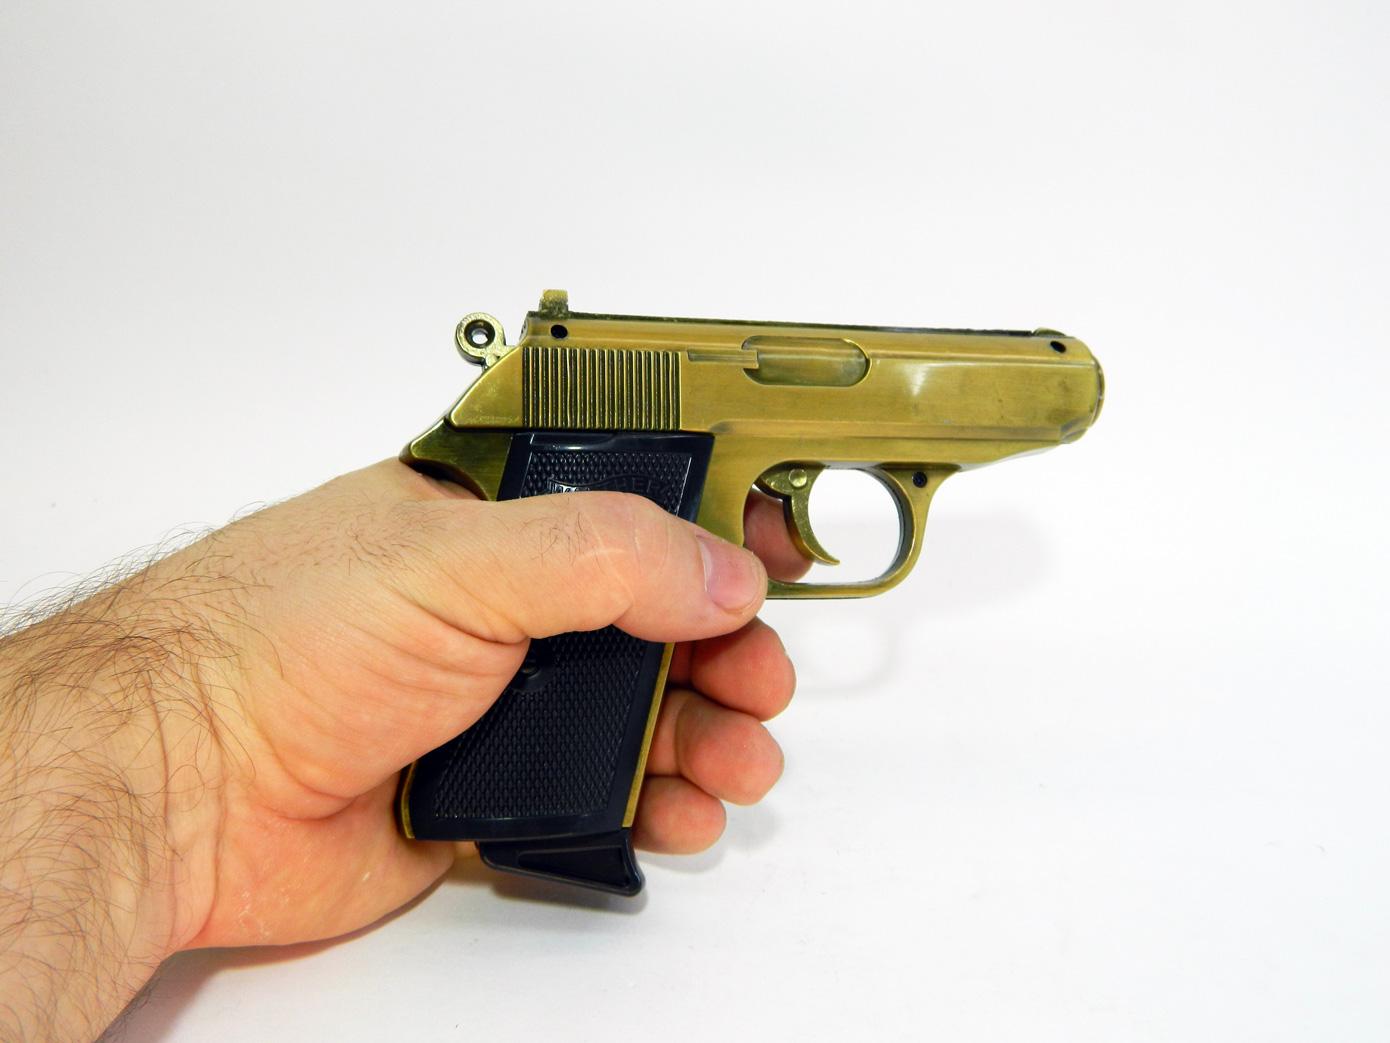 Пистолет Walther PPK/S бронза изображение 3